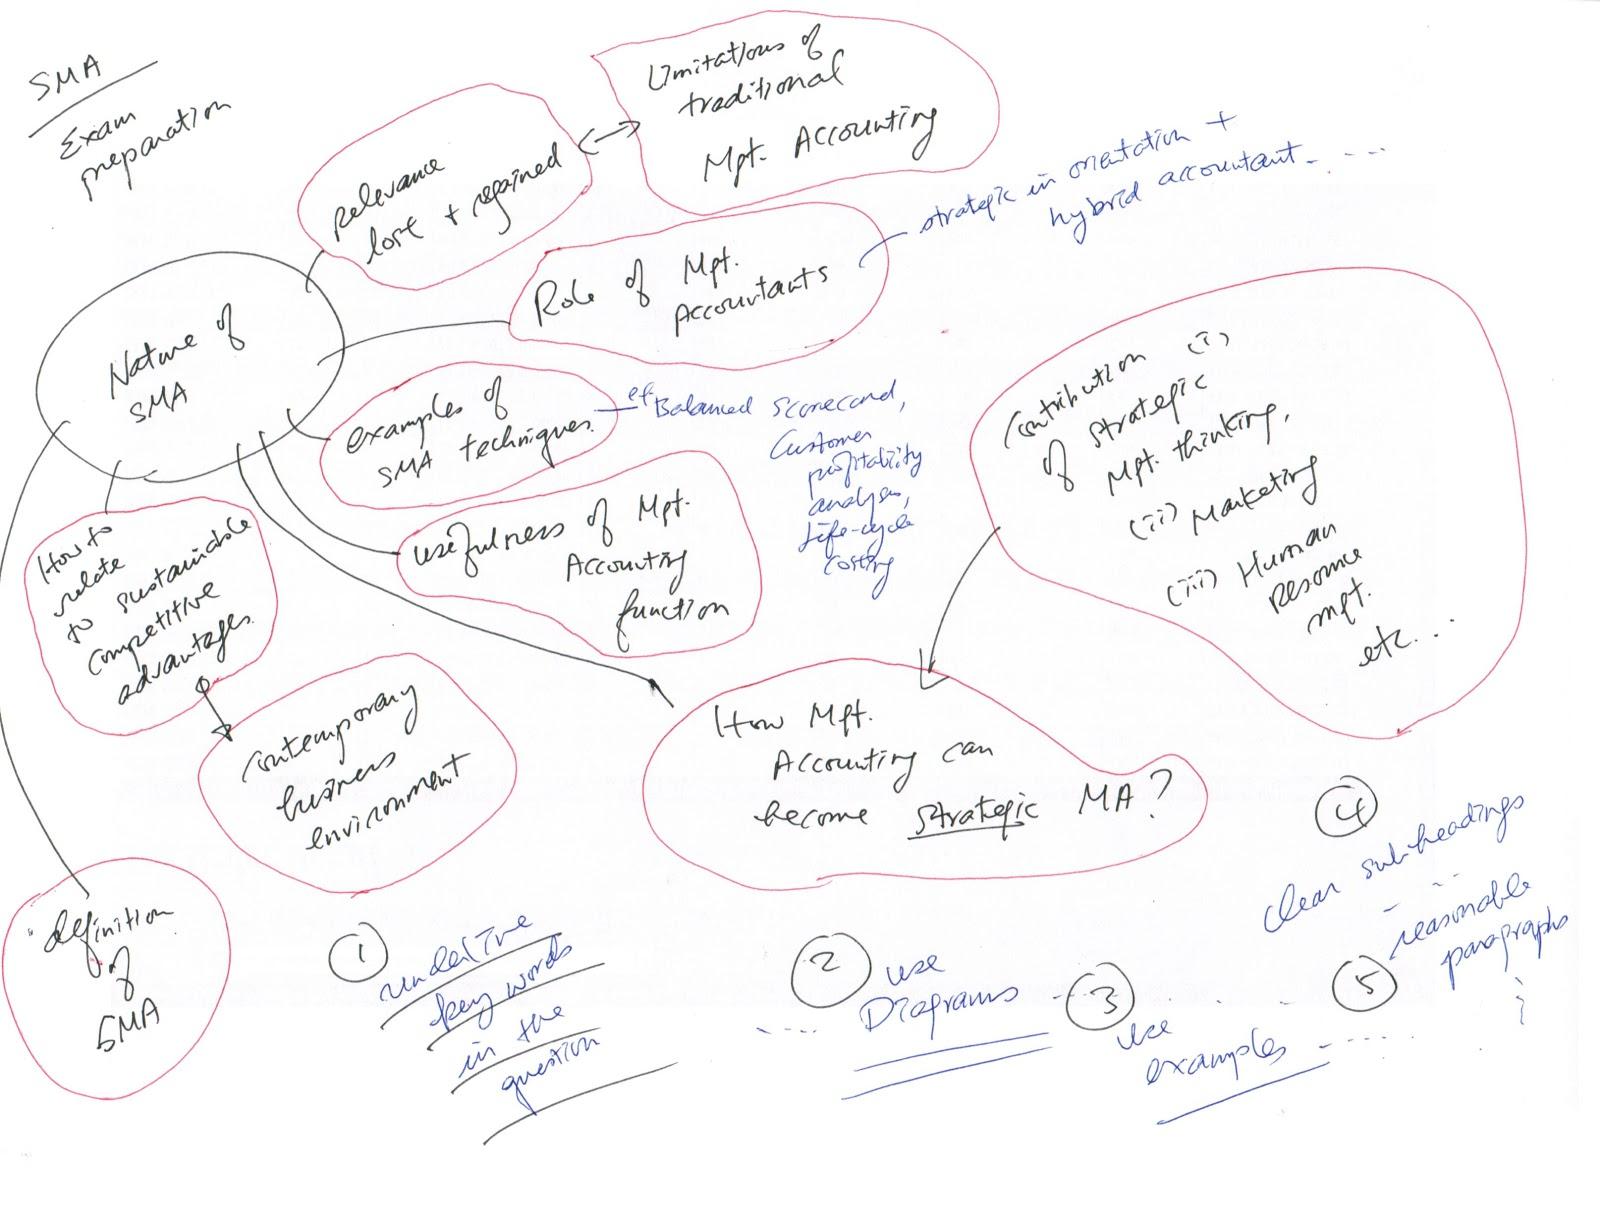 Examination preparation for Strategic Management Accounting